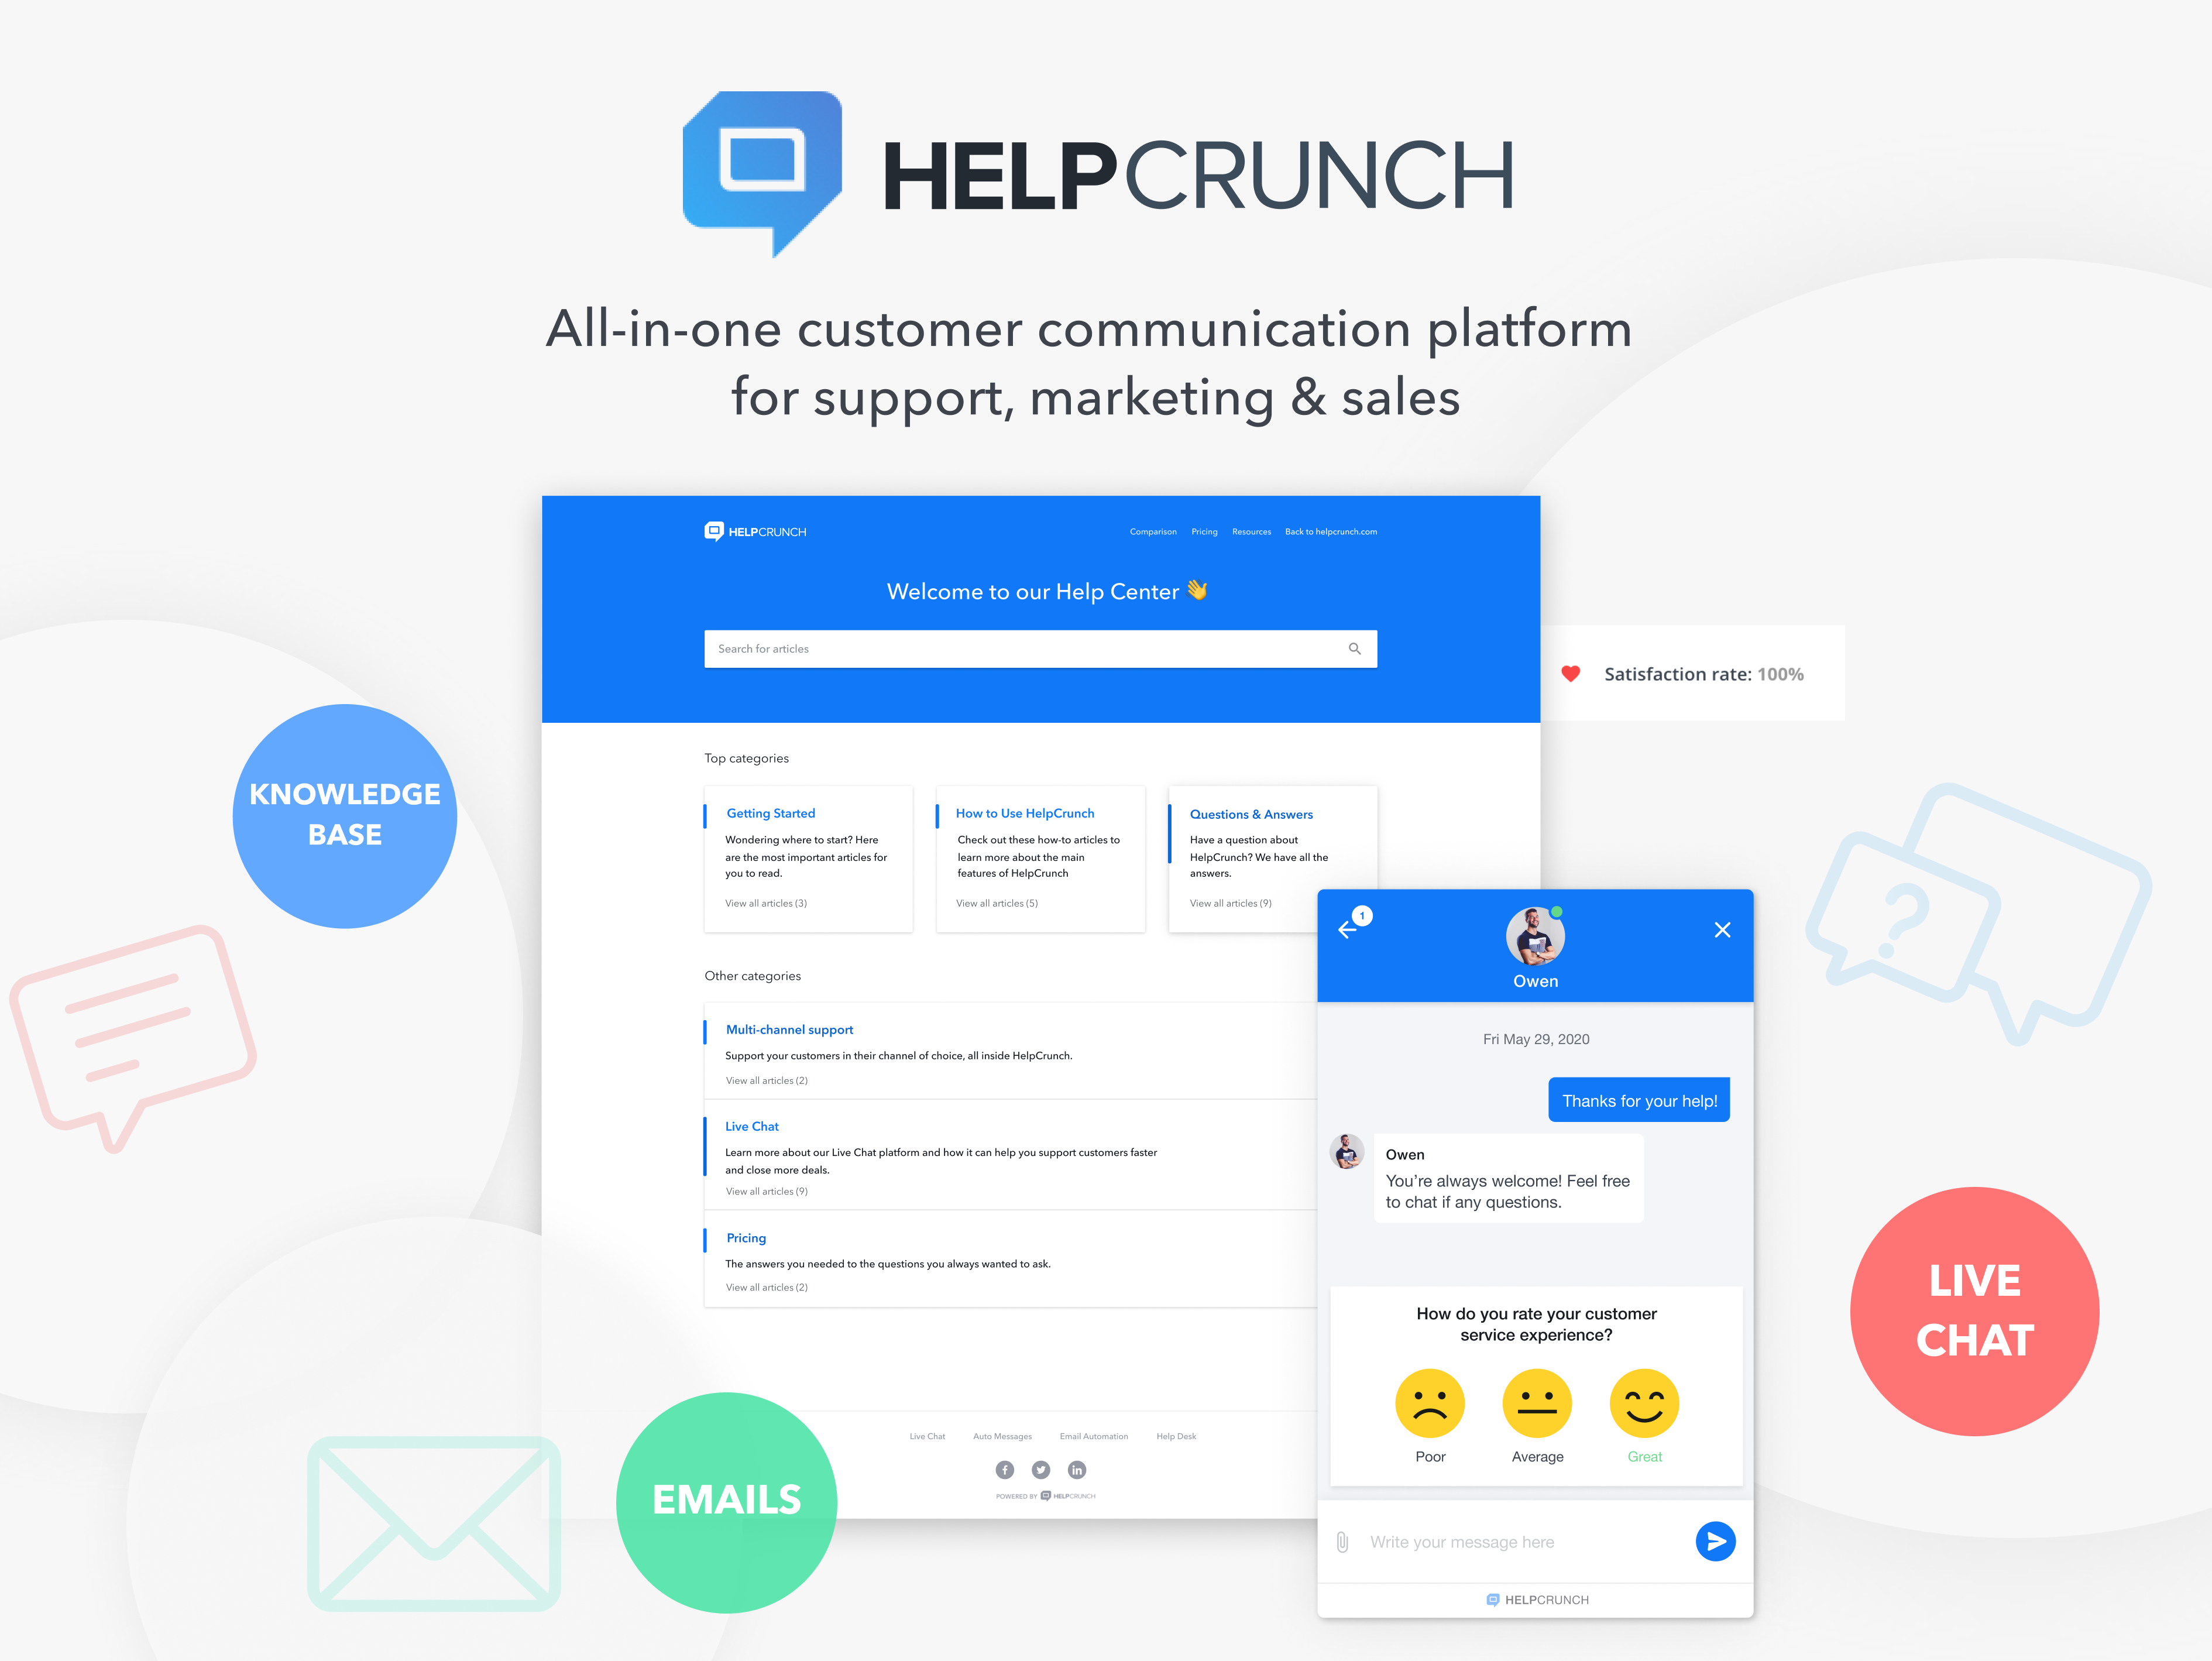 All-in-one customer communication platform